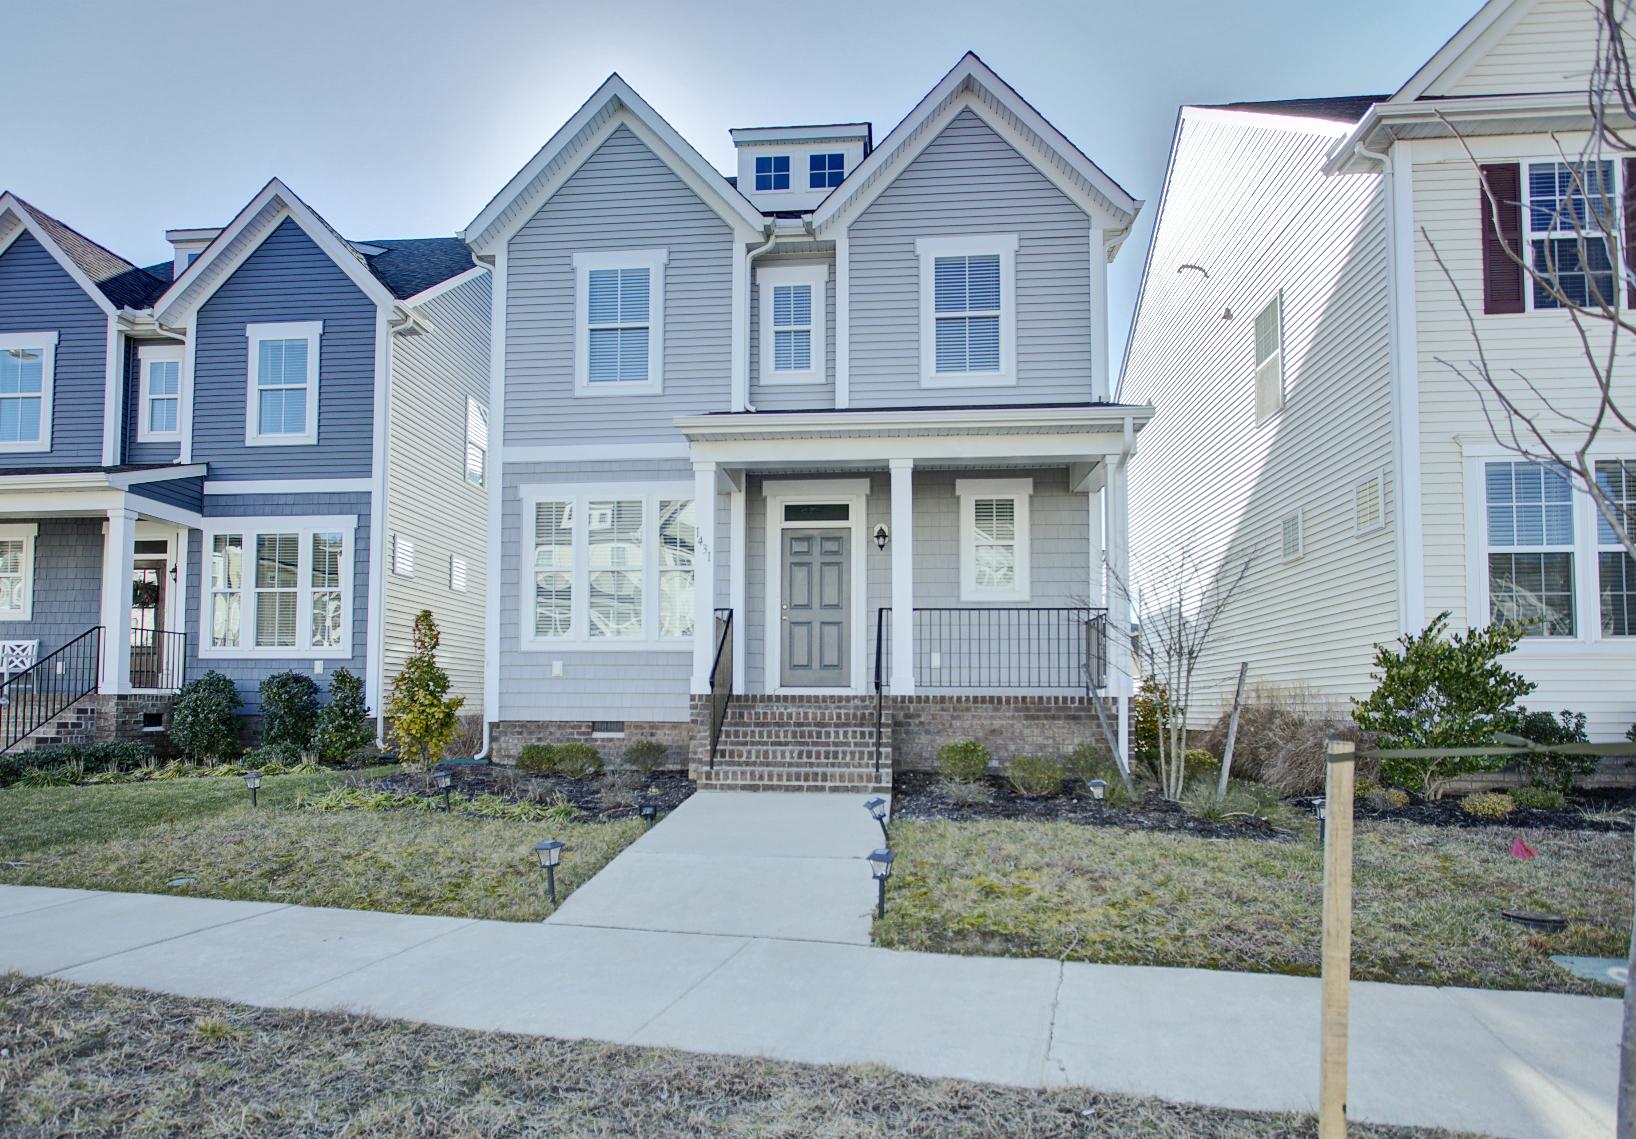 1431 Independence Blvd, Newport News, VA 23608